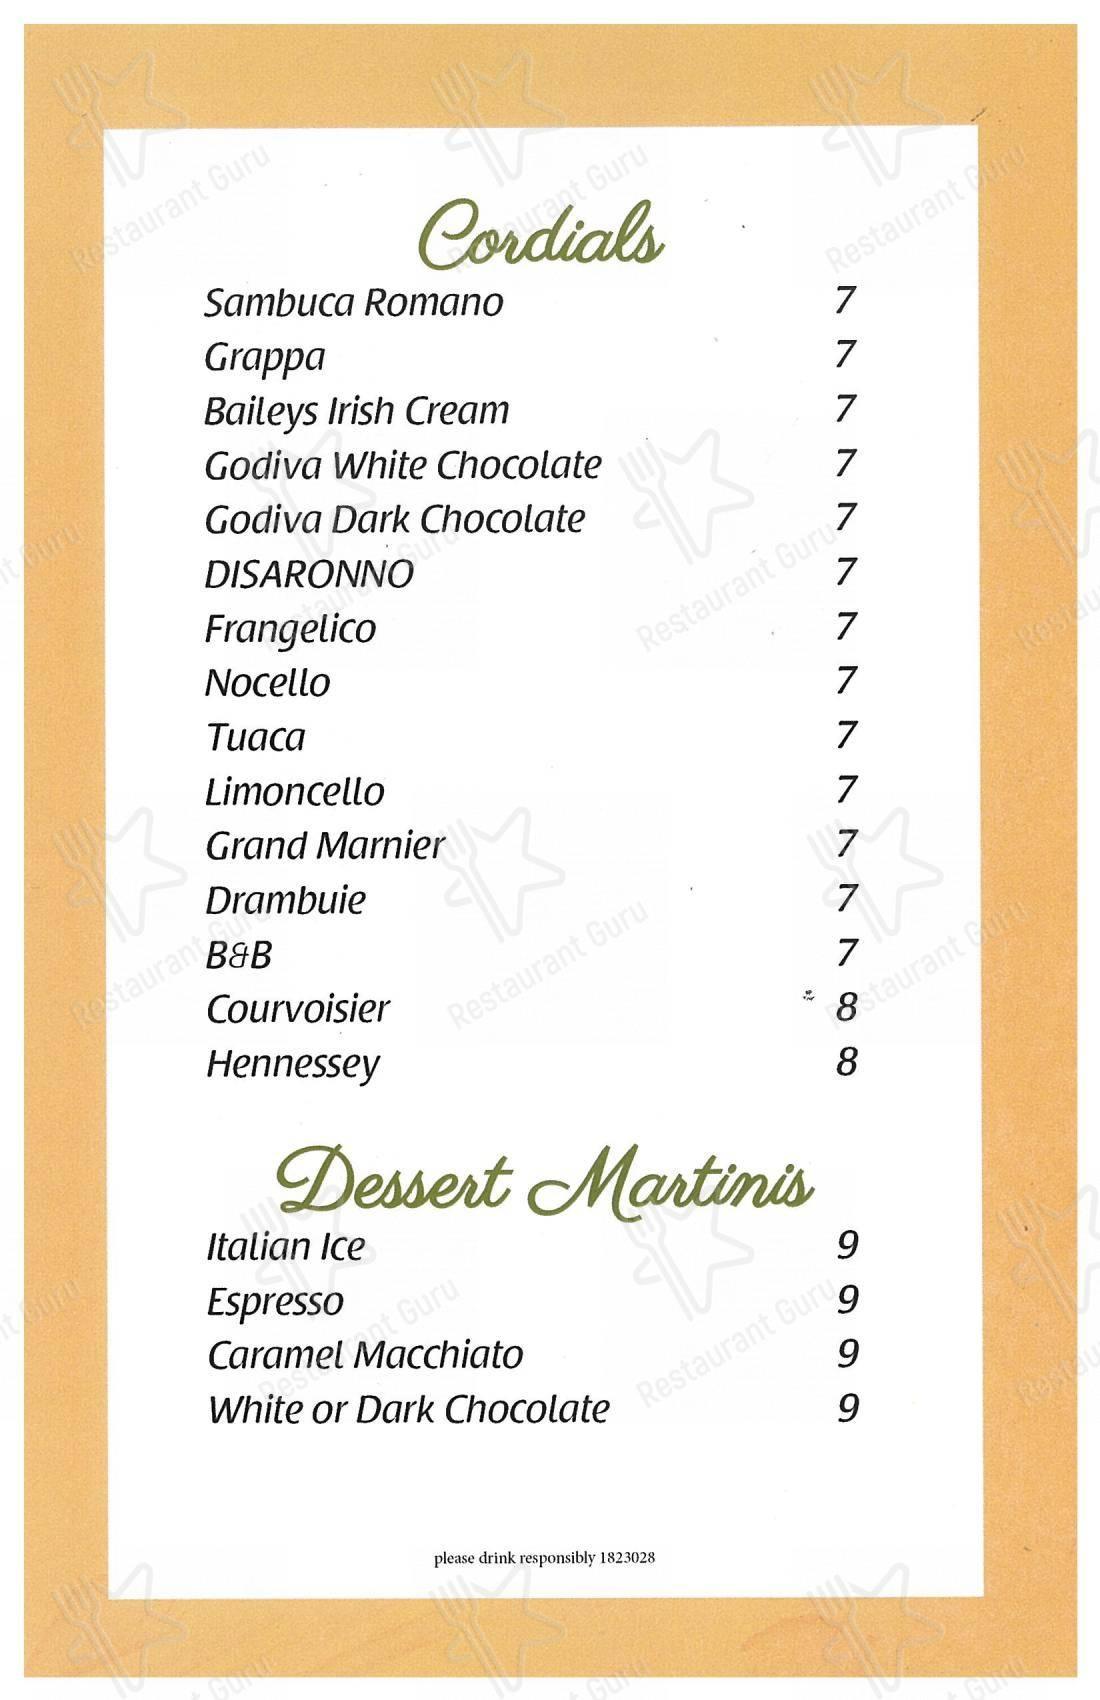 La Gondola menu - meals and drinks